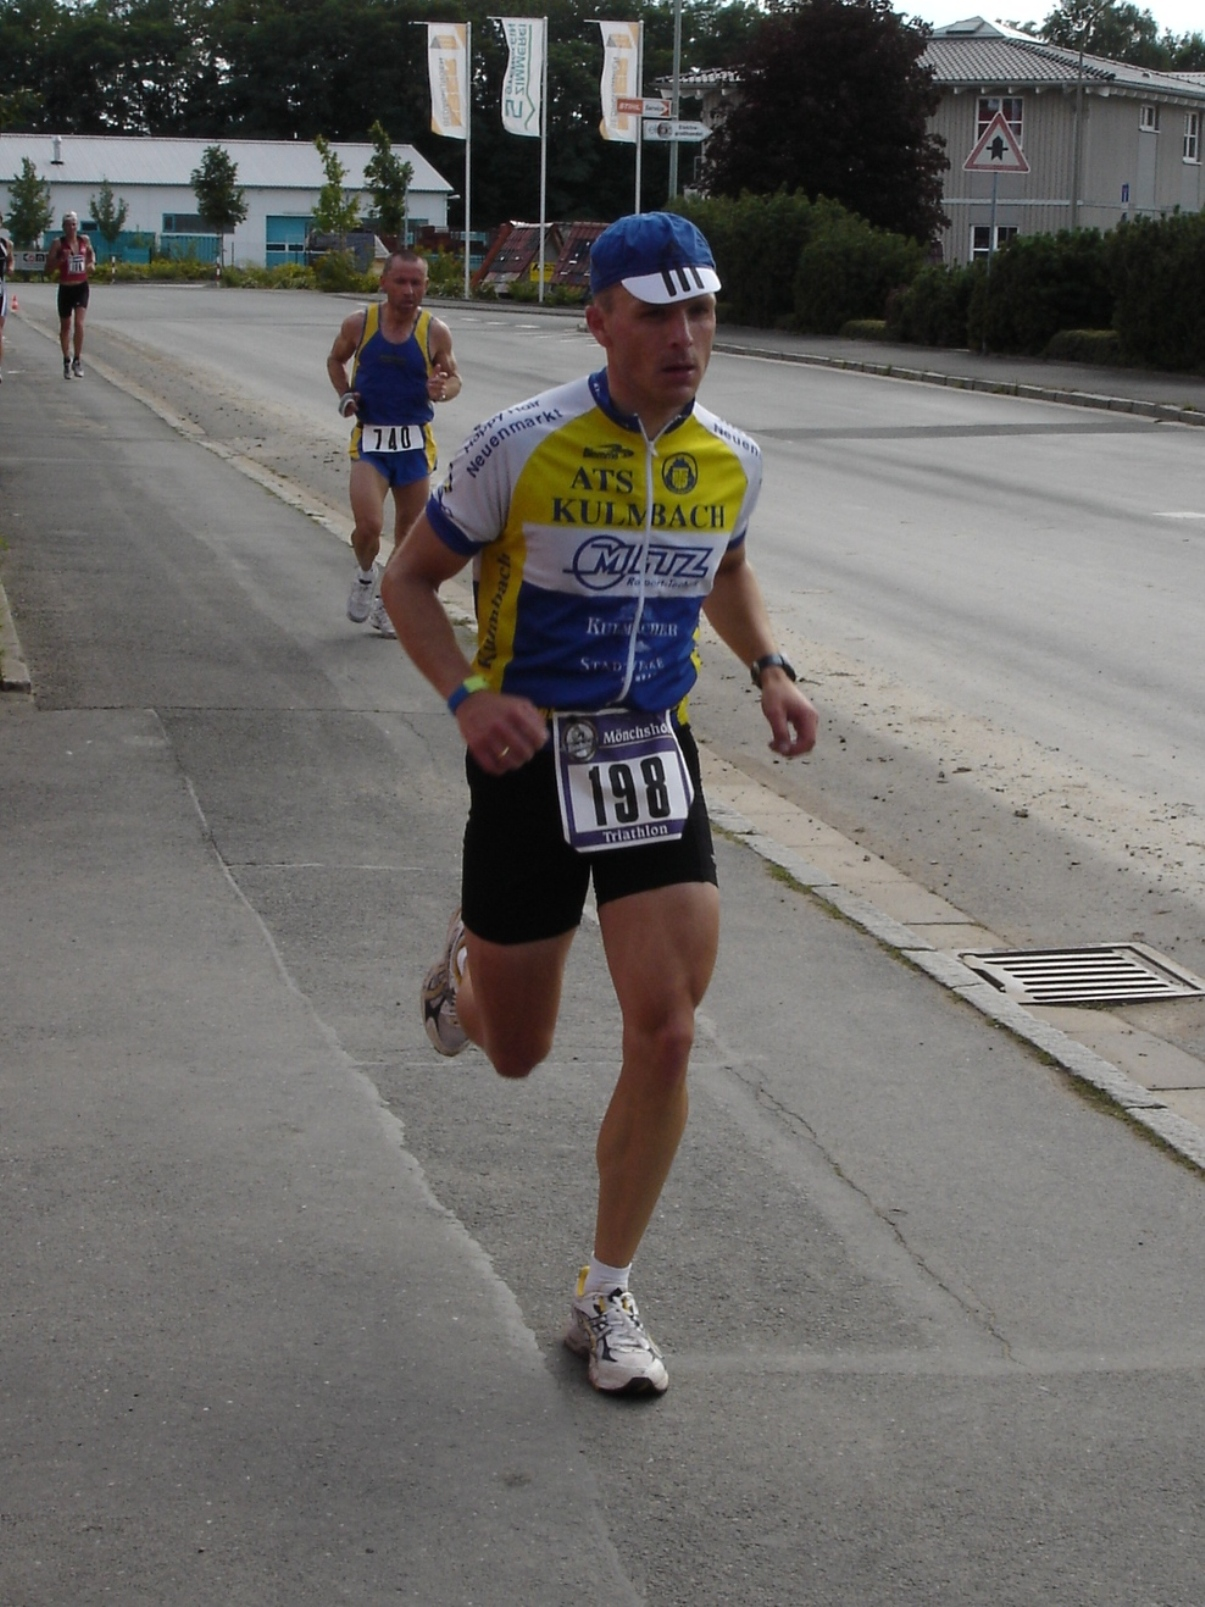 Mönchshof Triathlon